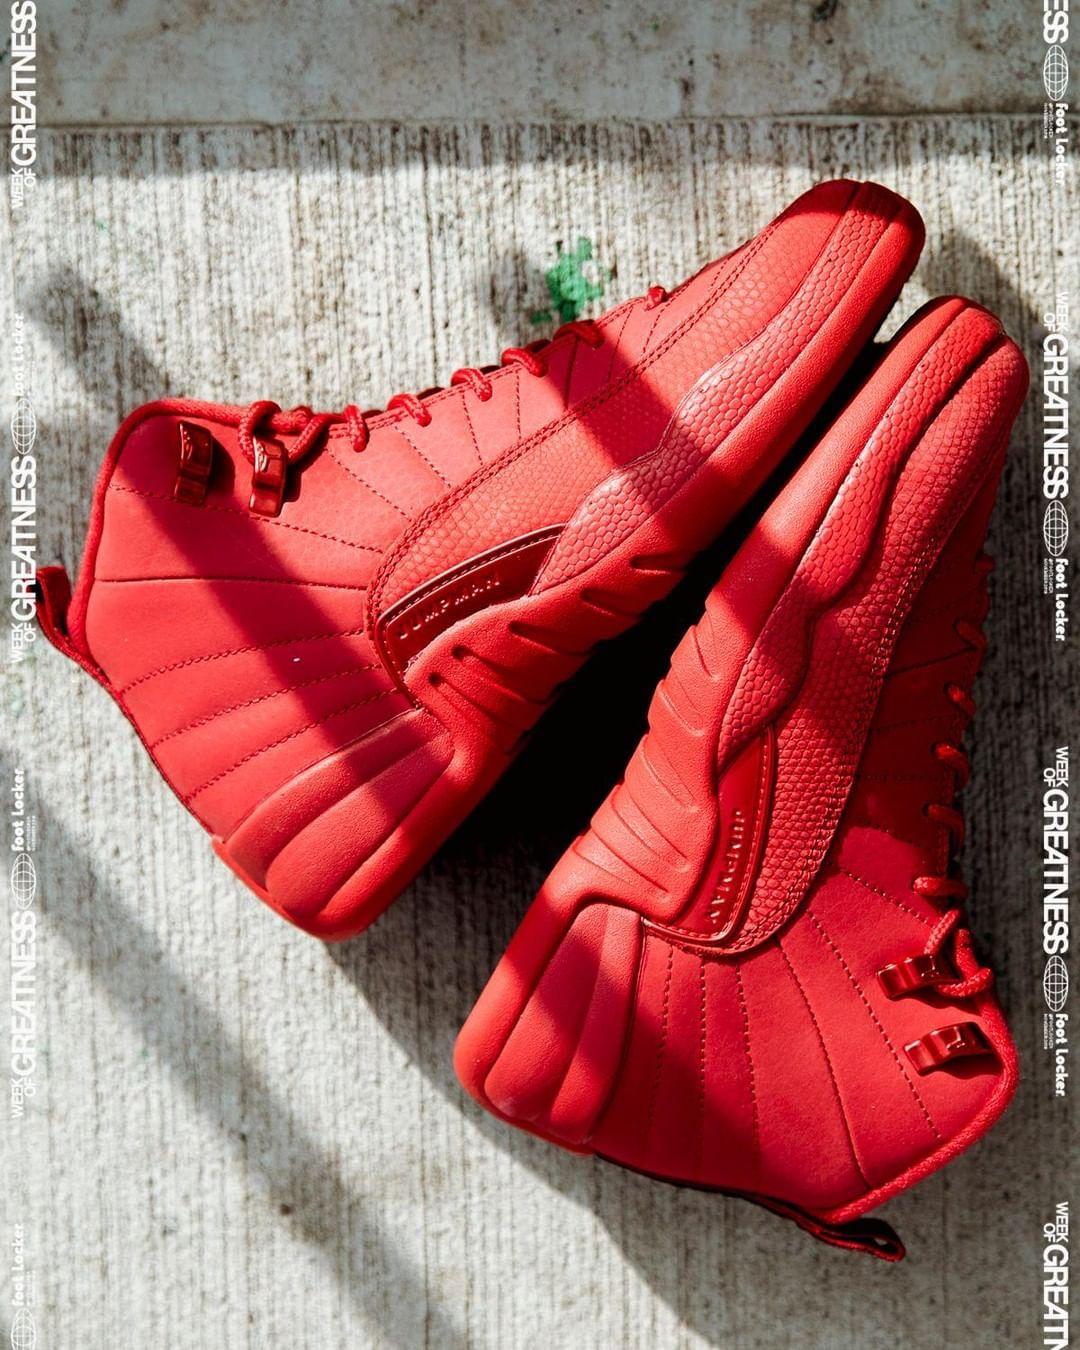 c63a557799a Jordan Retro 12 'Gym Red' | SNEAK A PEAK♥ in 2019 | Jordan retro 12 ...